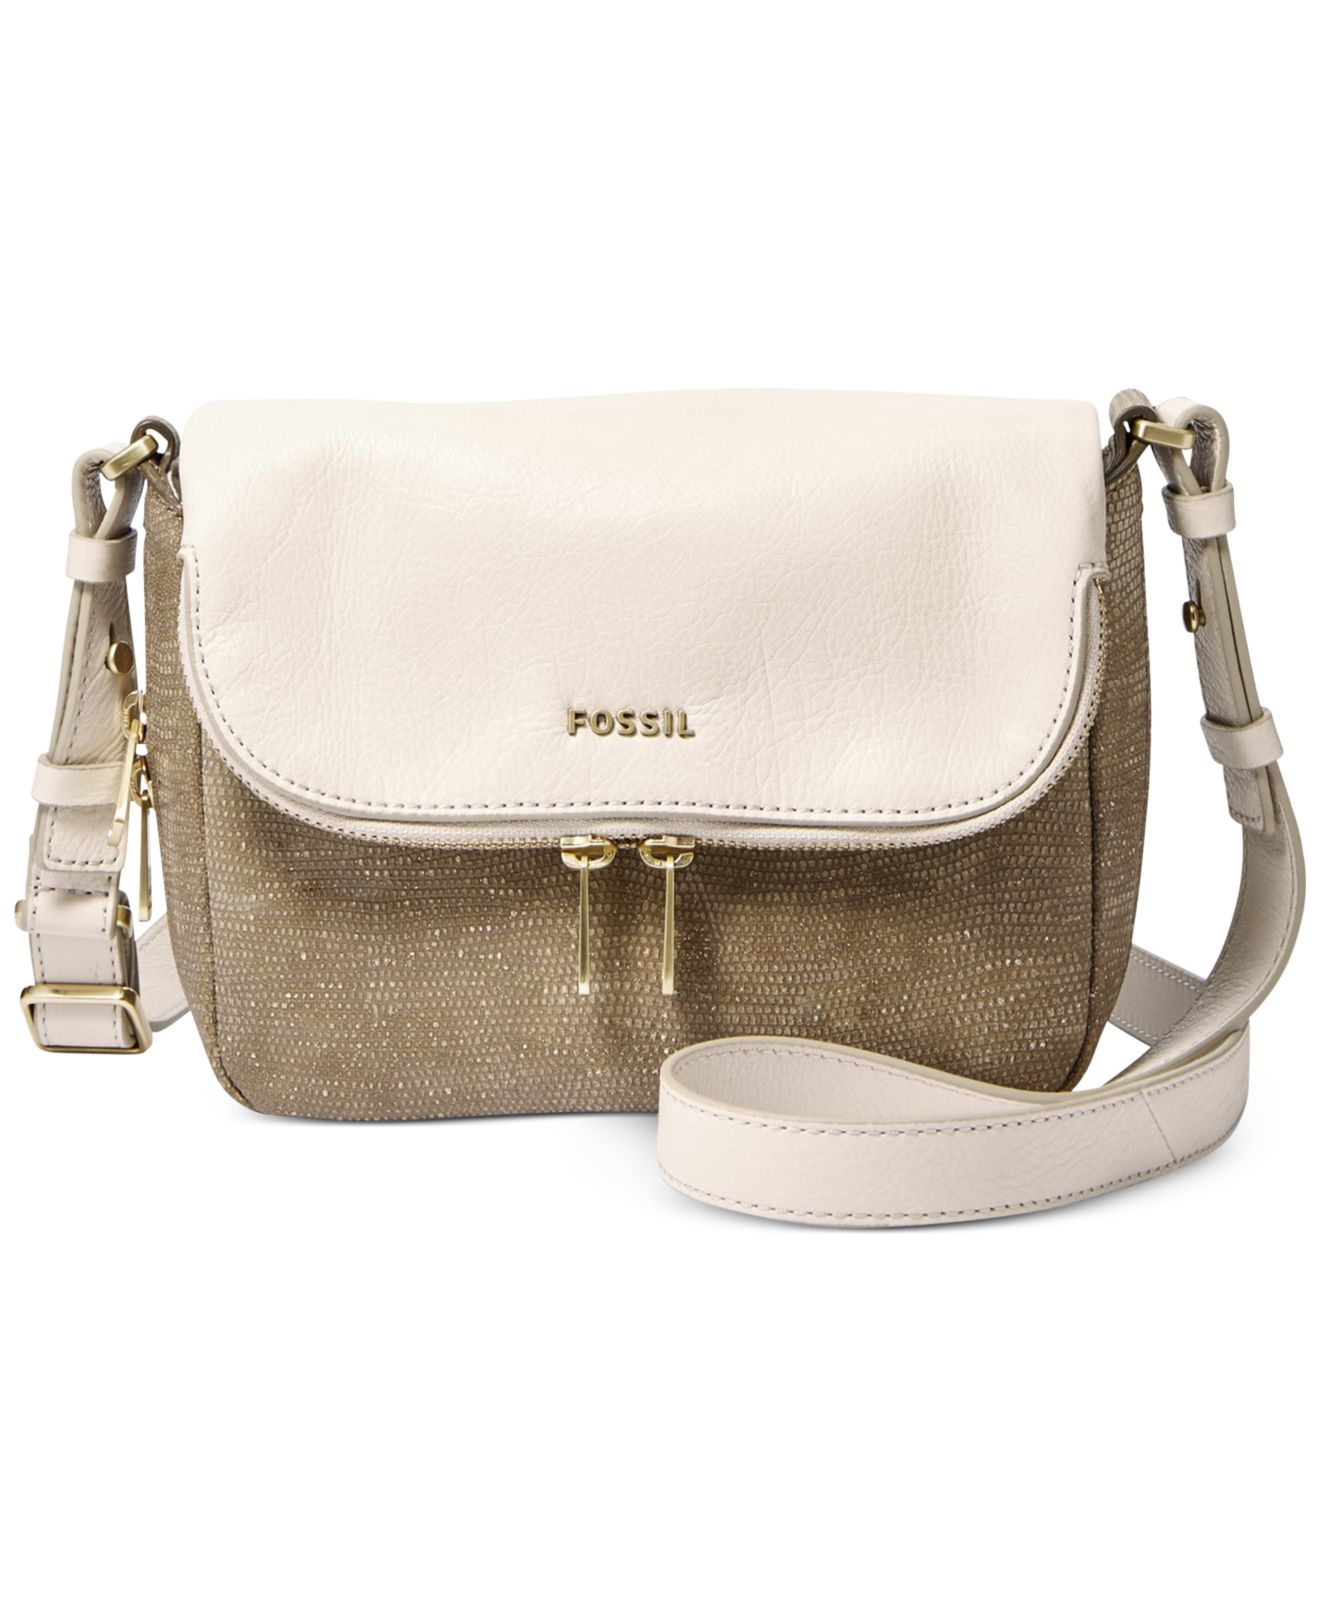 Fossil Crossbody Handbags Uk Best Handbag 2018 Emma Tote Blue Print Ew Bag Pe